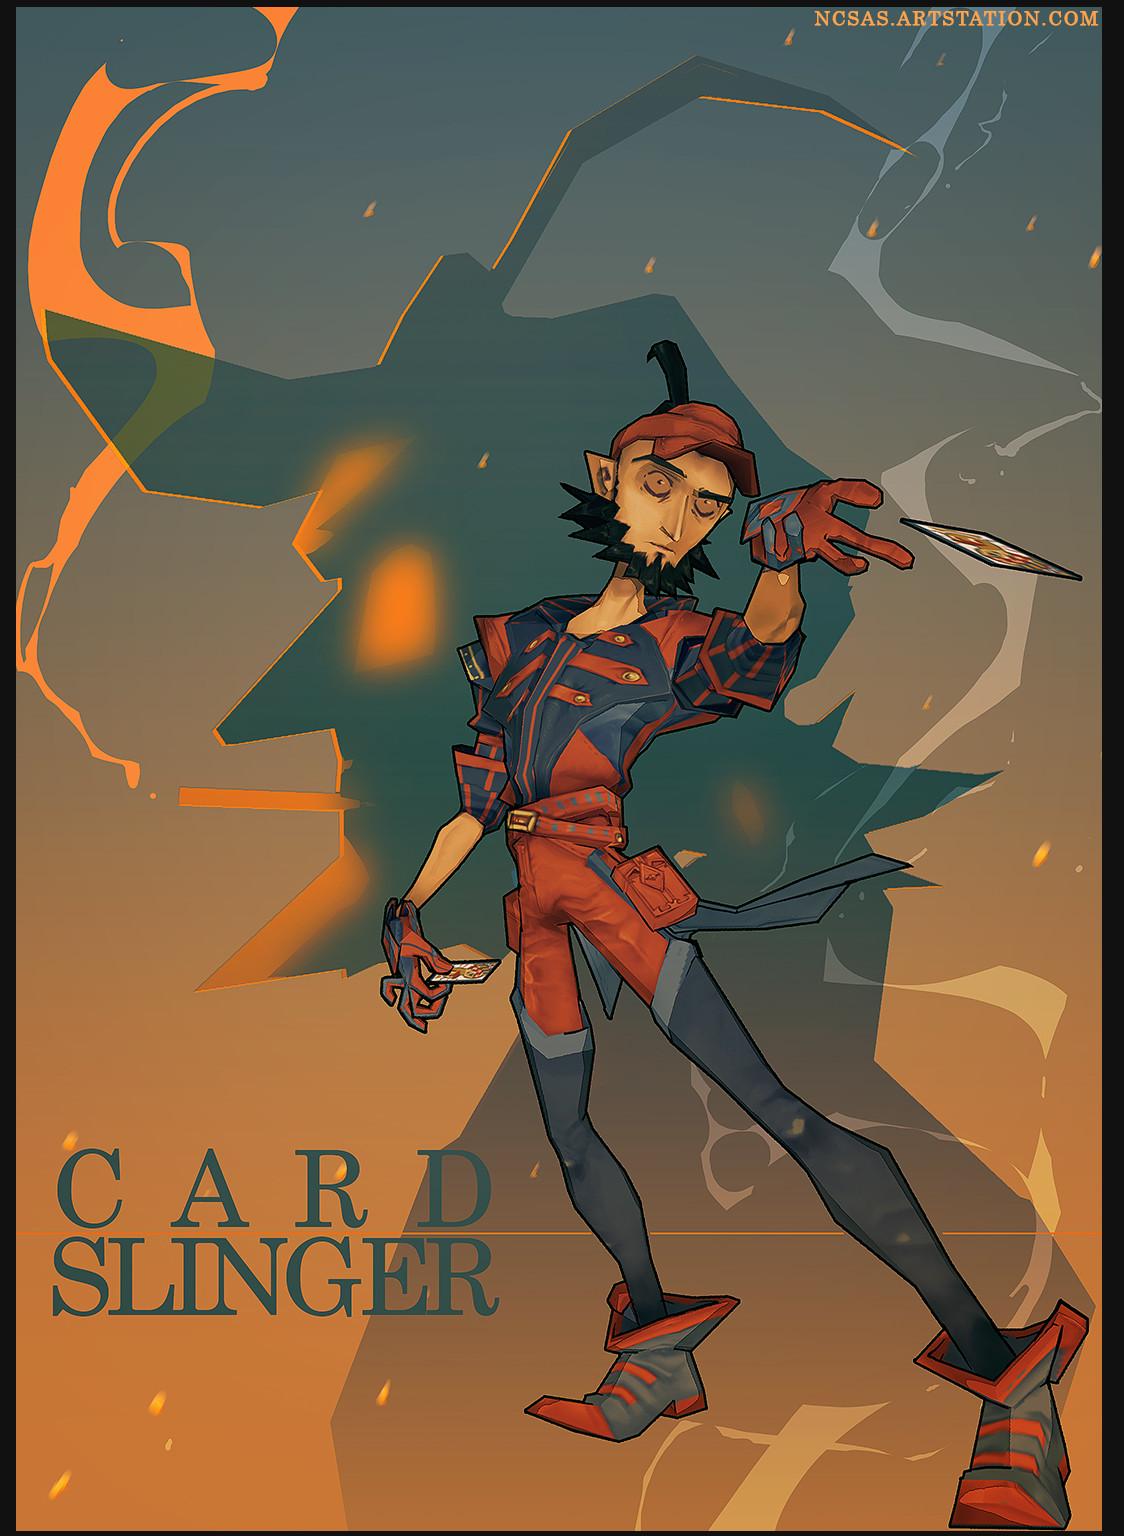 Cardslinger Slingin' cards in his full glory